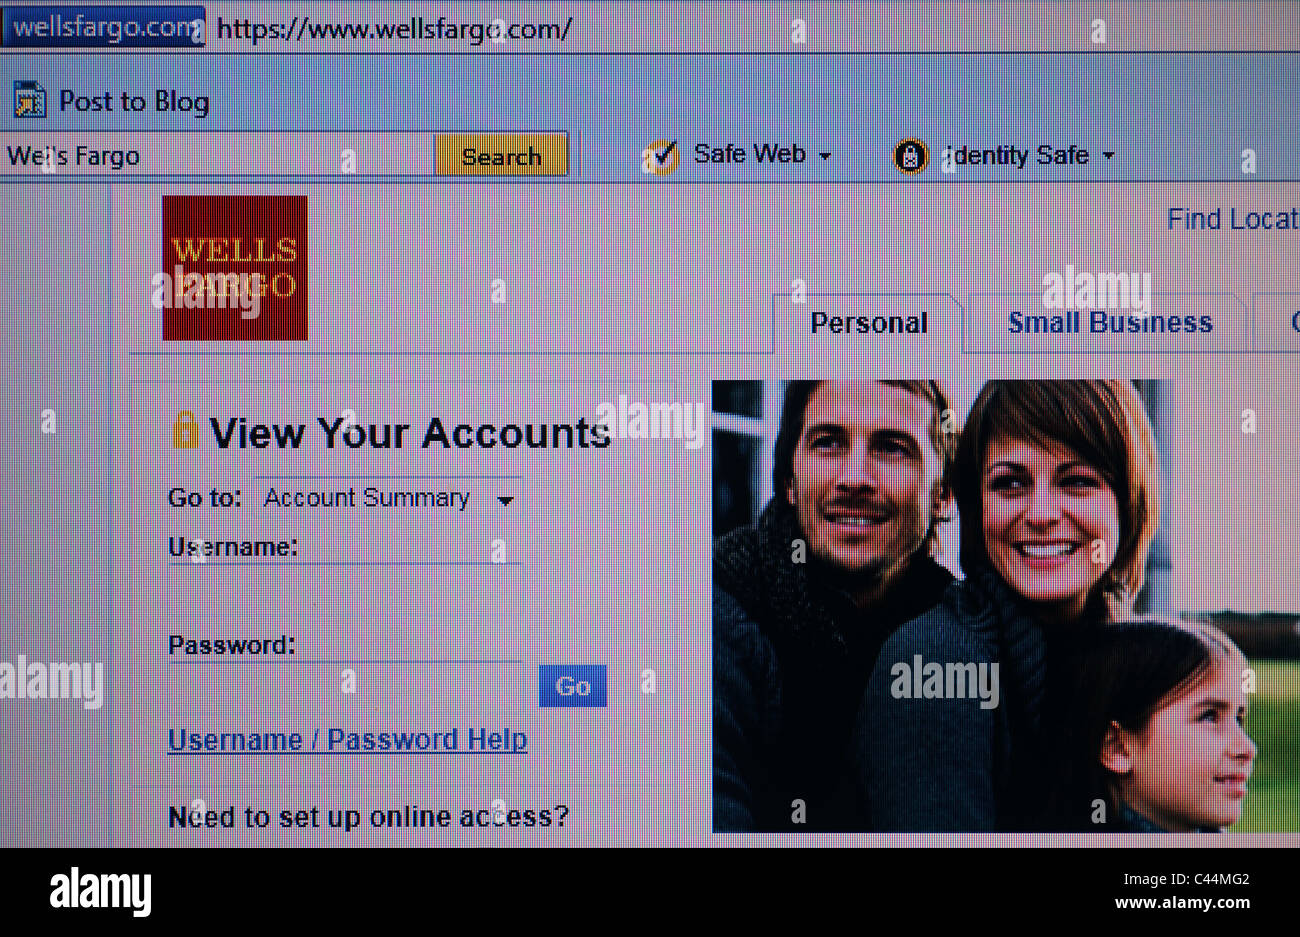 wells fargo,bank,website,finance,business,online,bank